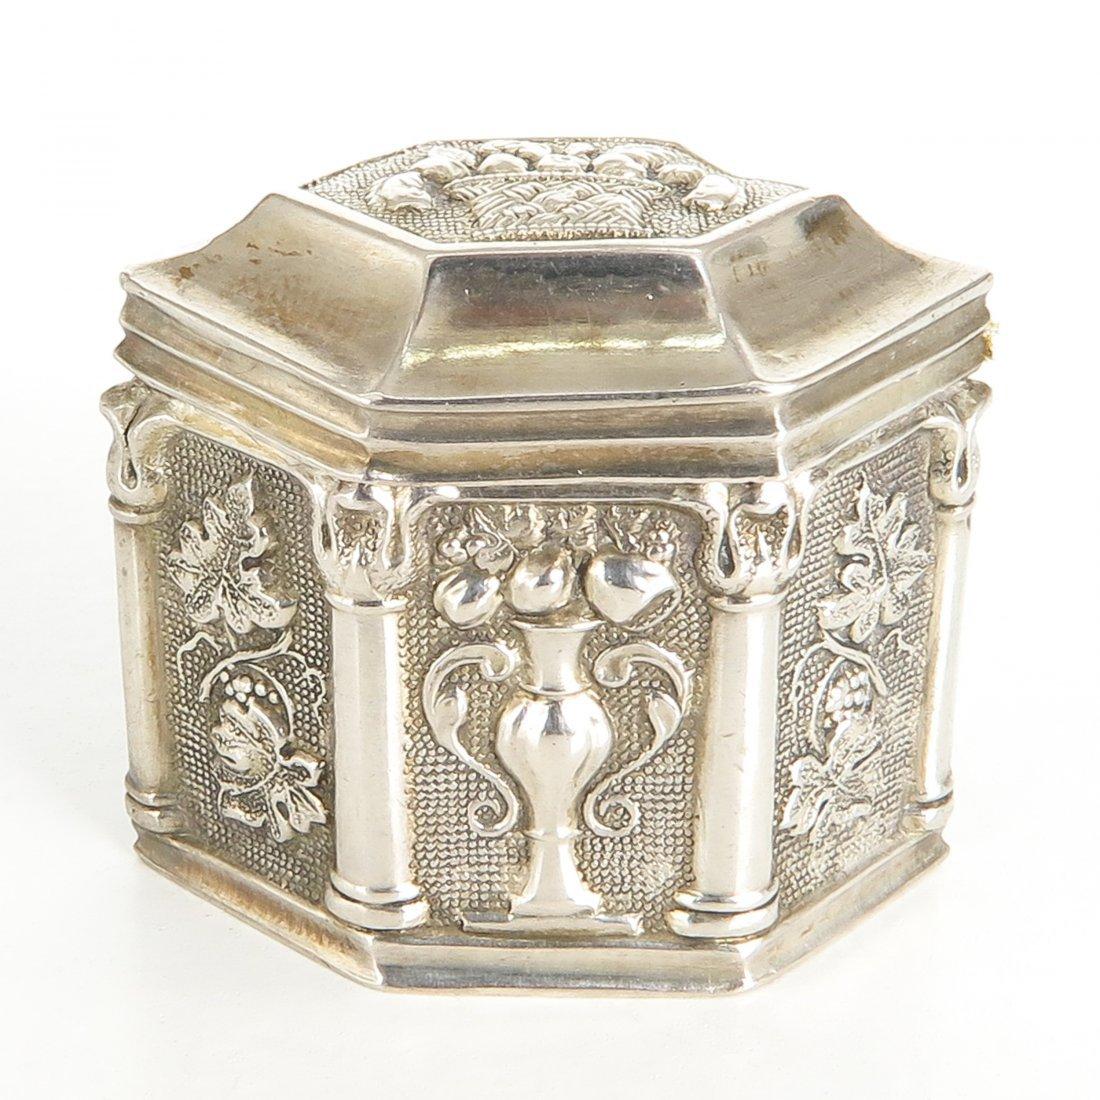 Dutch Silver Loderein Box or Scent Box